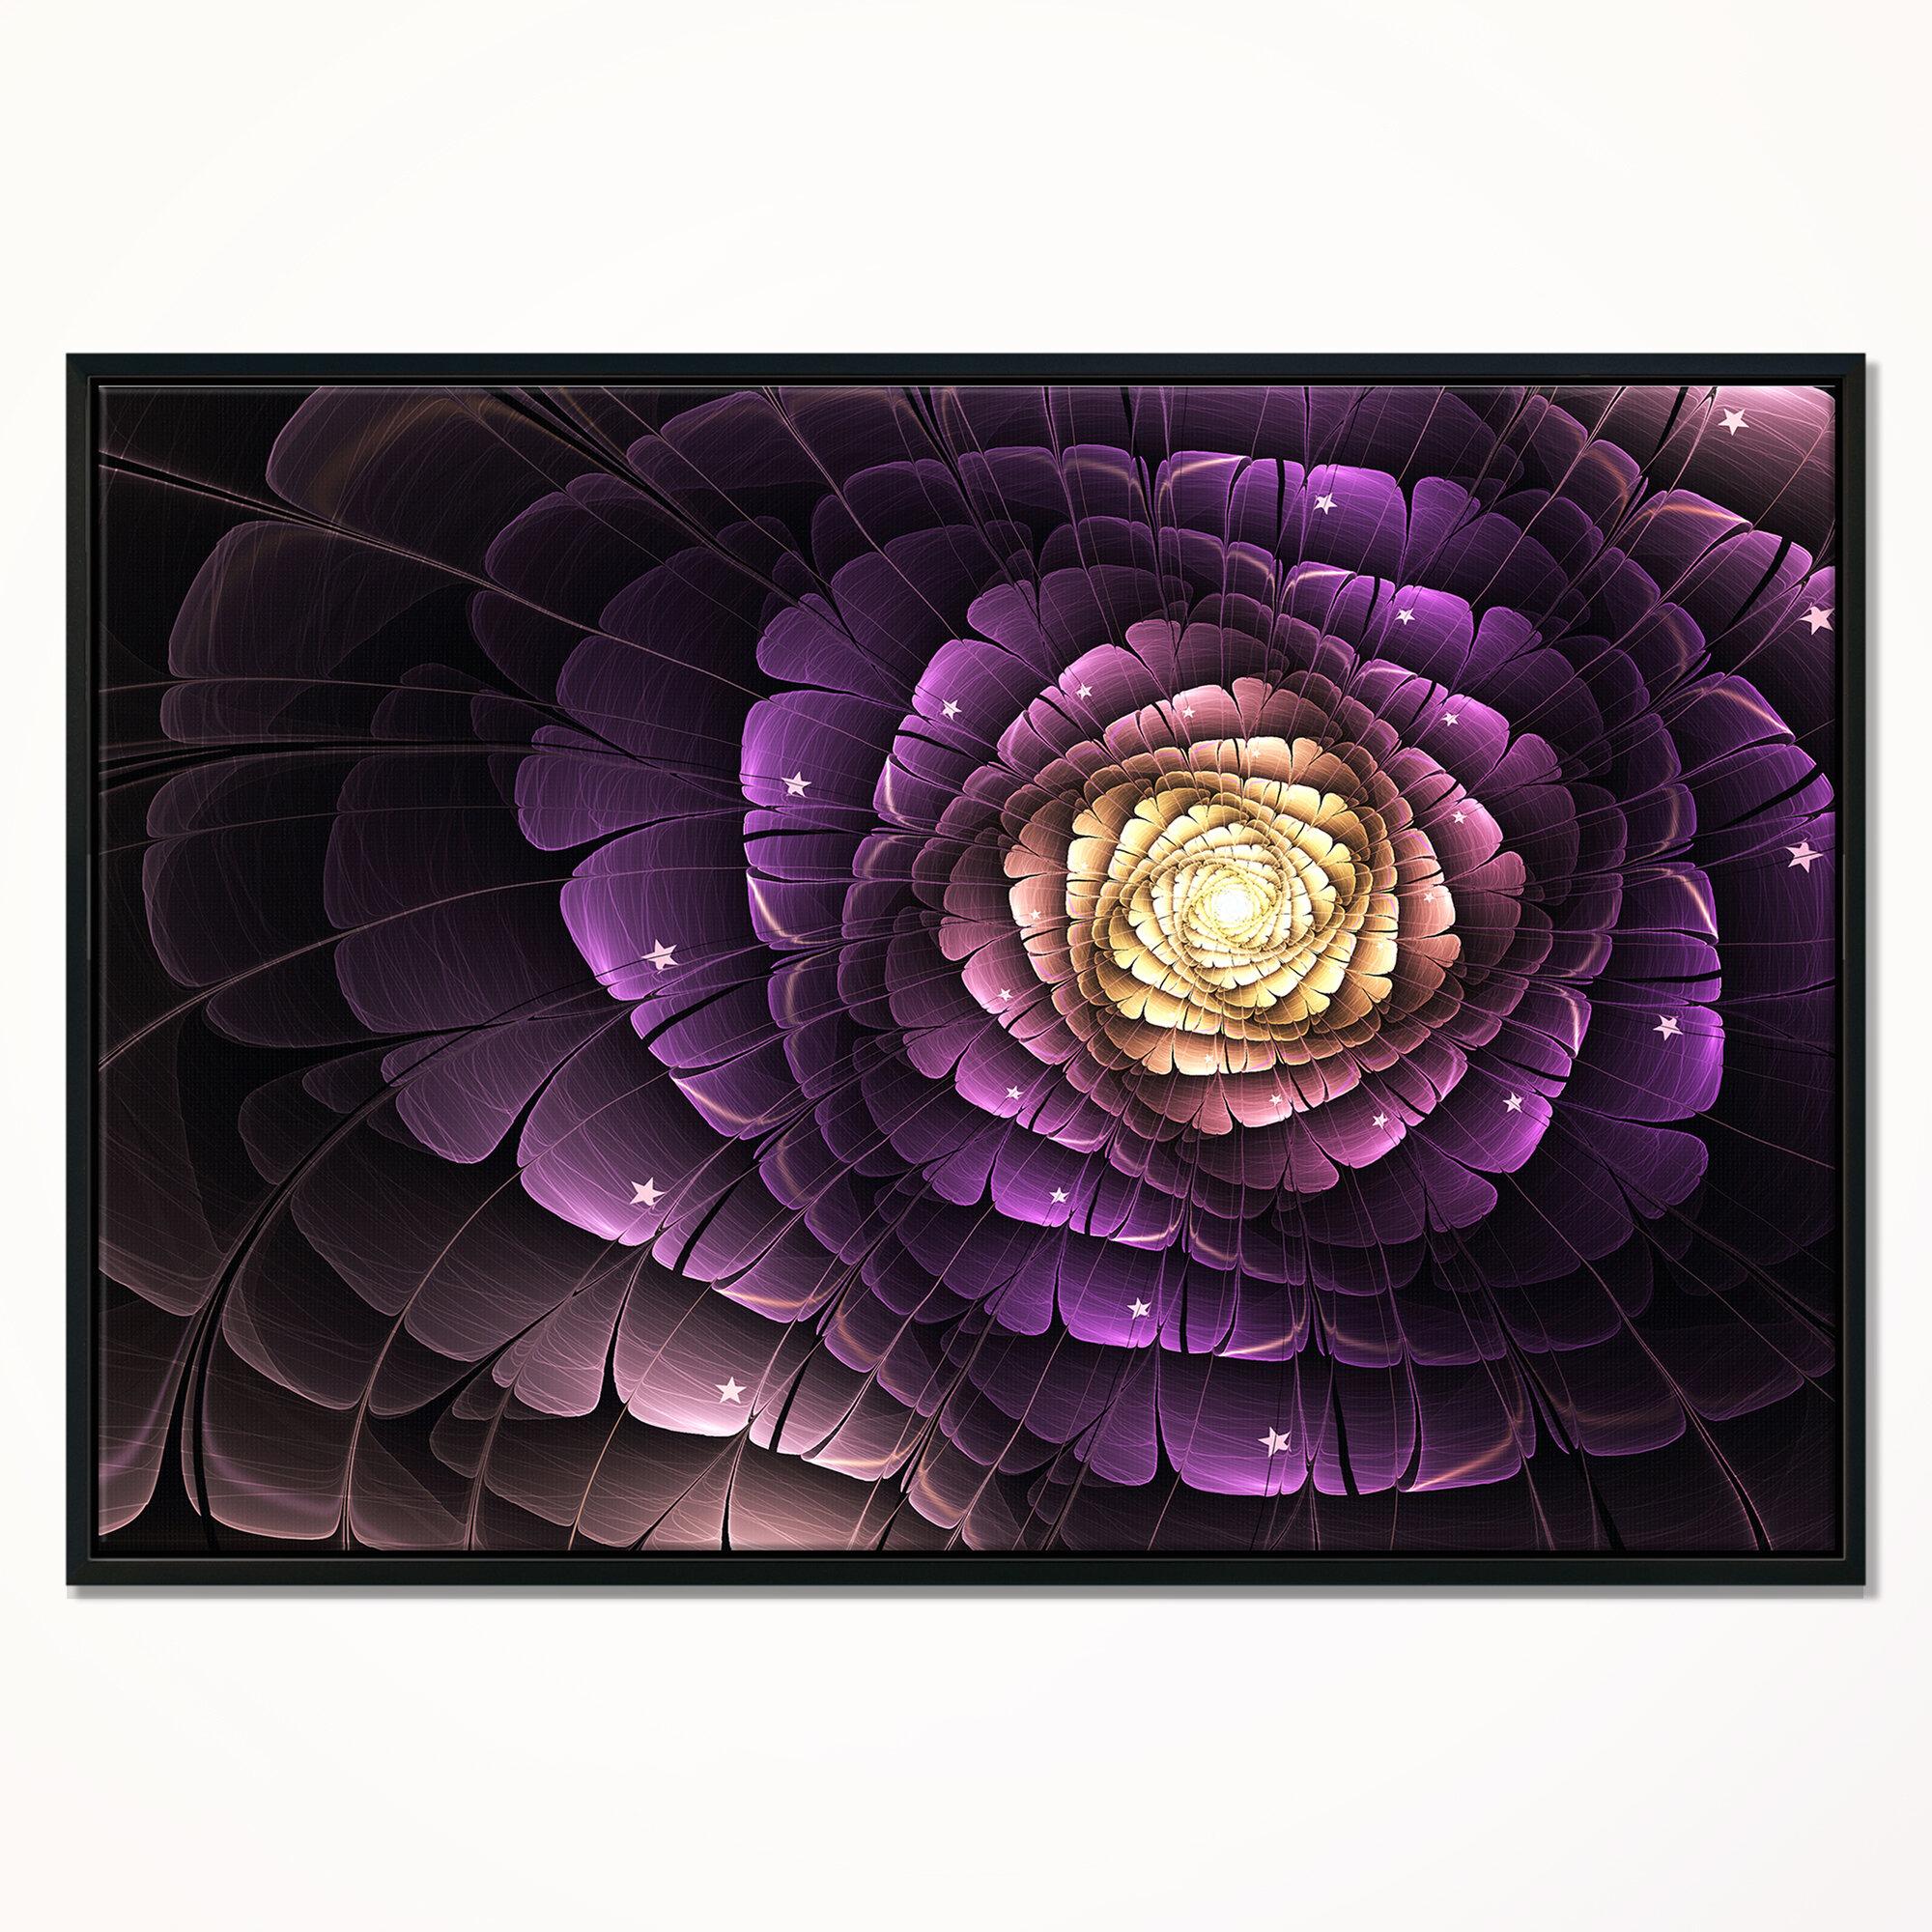 East Urban Home Fractal Flower Light Purple Digital Art Framed Graphic Art Print On Wrapped Canvas Wayfair